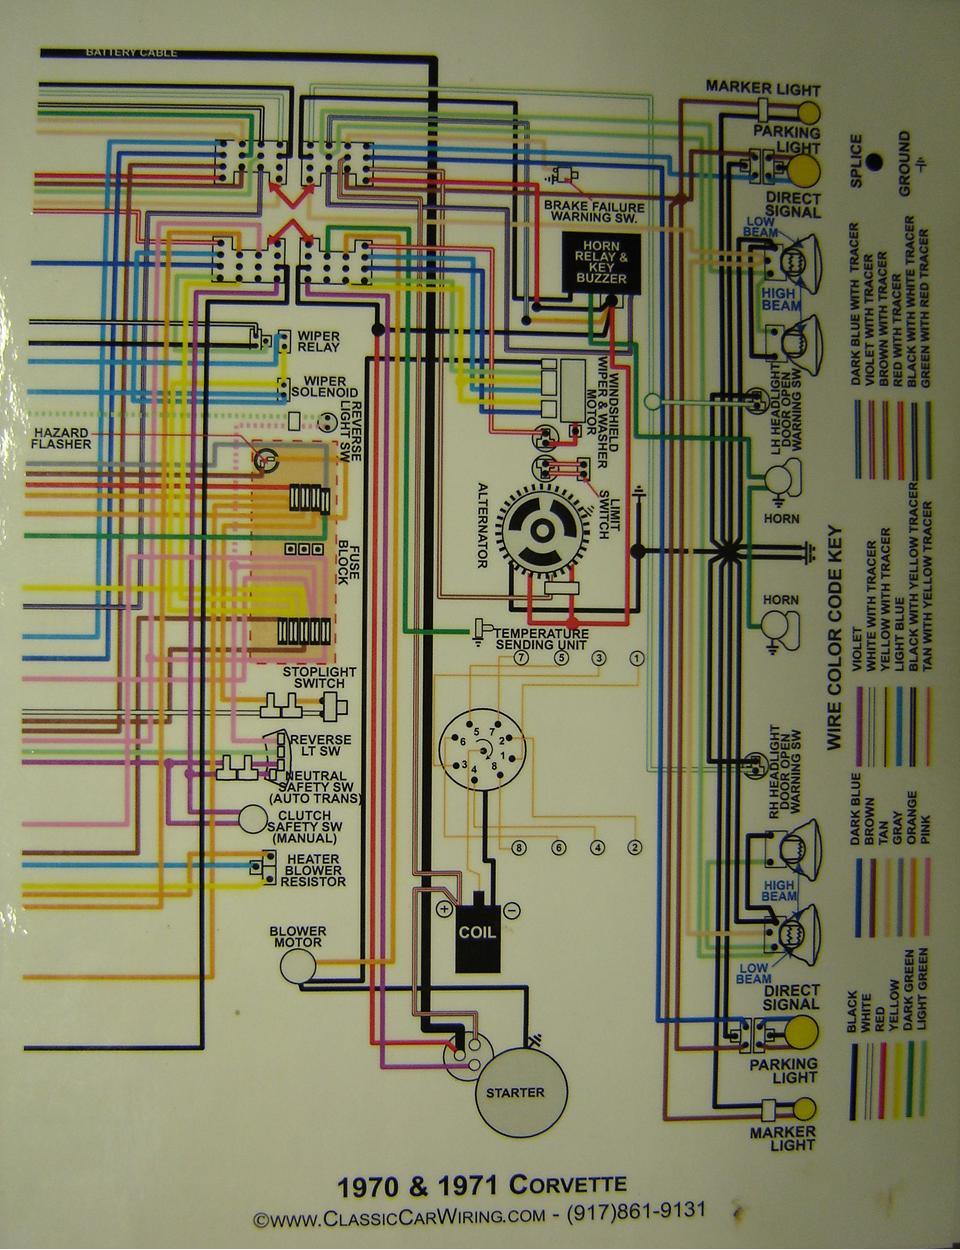 Fabulous Chevy Vega Wiring Harness Diagram Wiring Diagram Wiring Cloud Overrenstrafr09Org